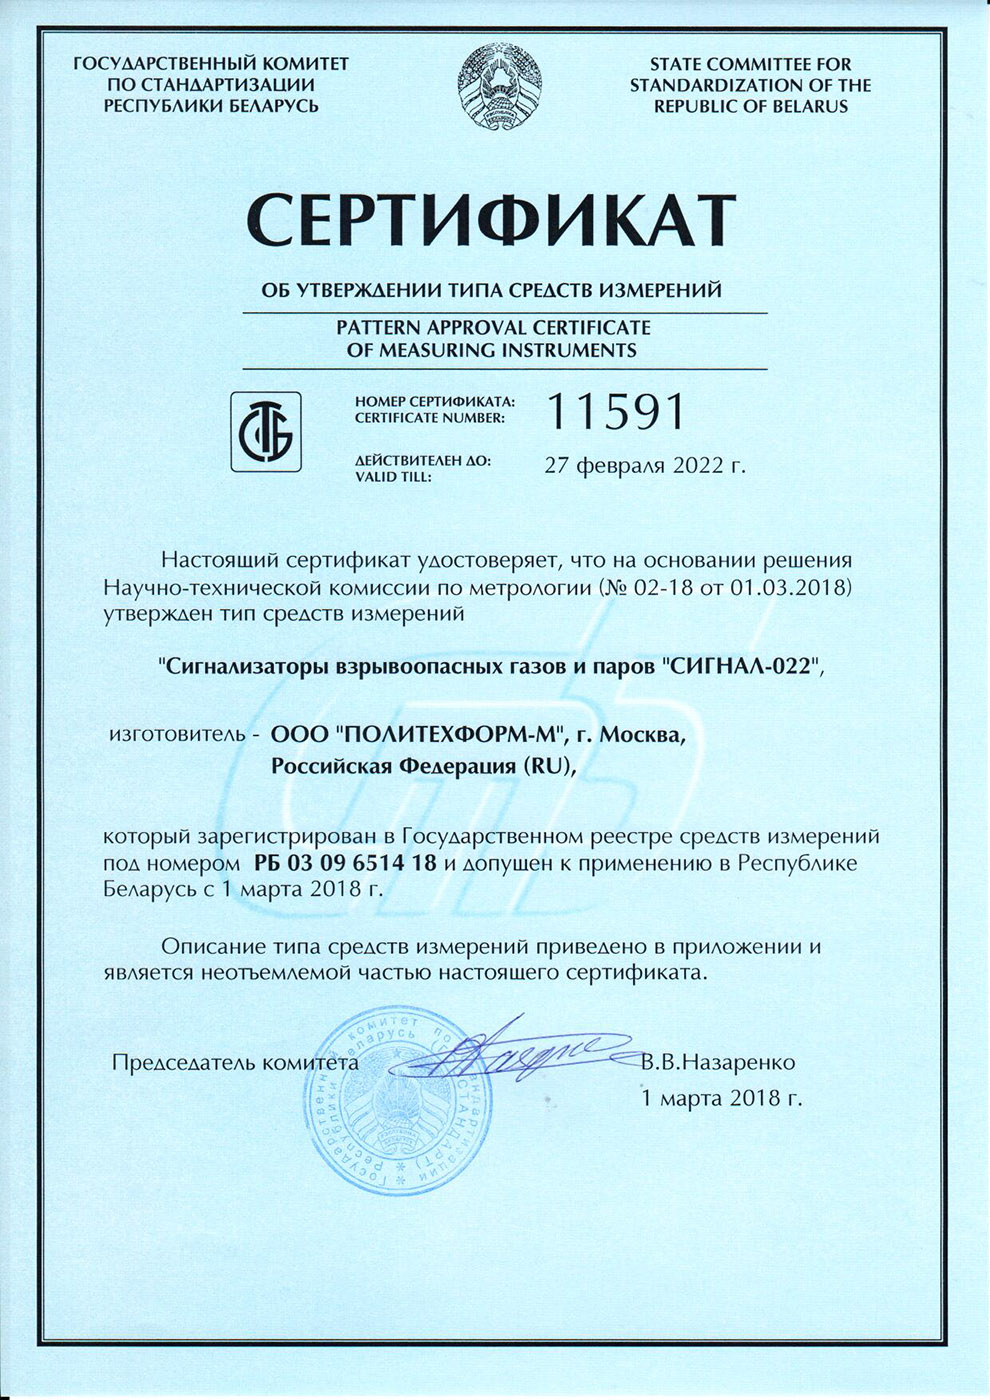 Сертификат описание типа